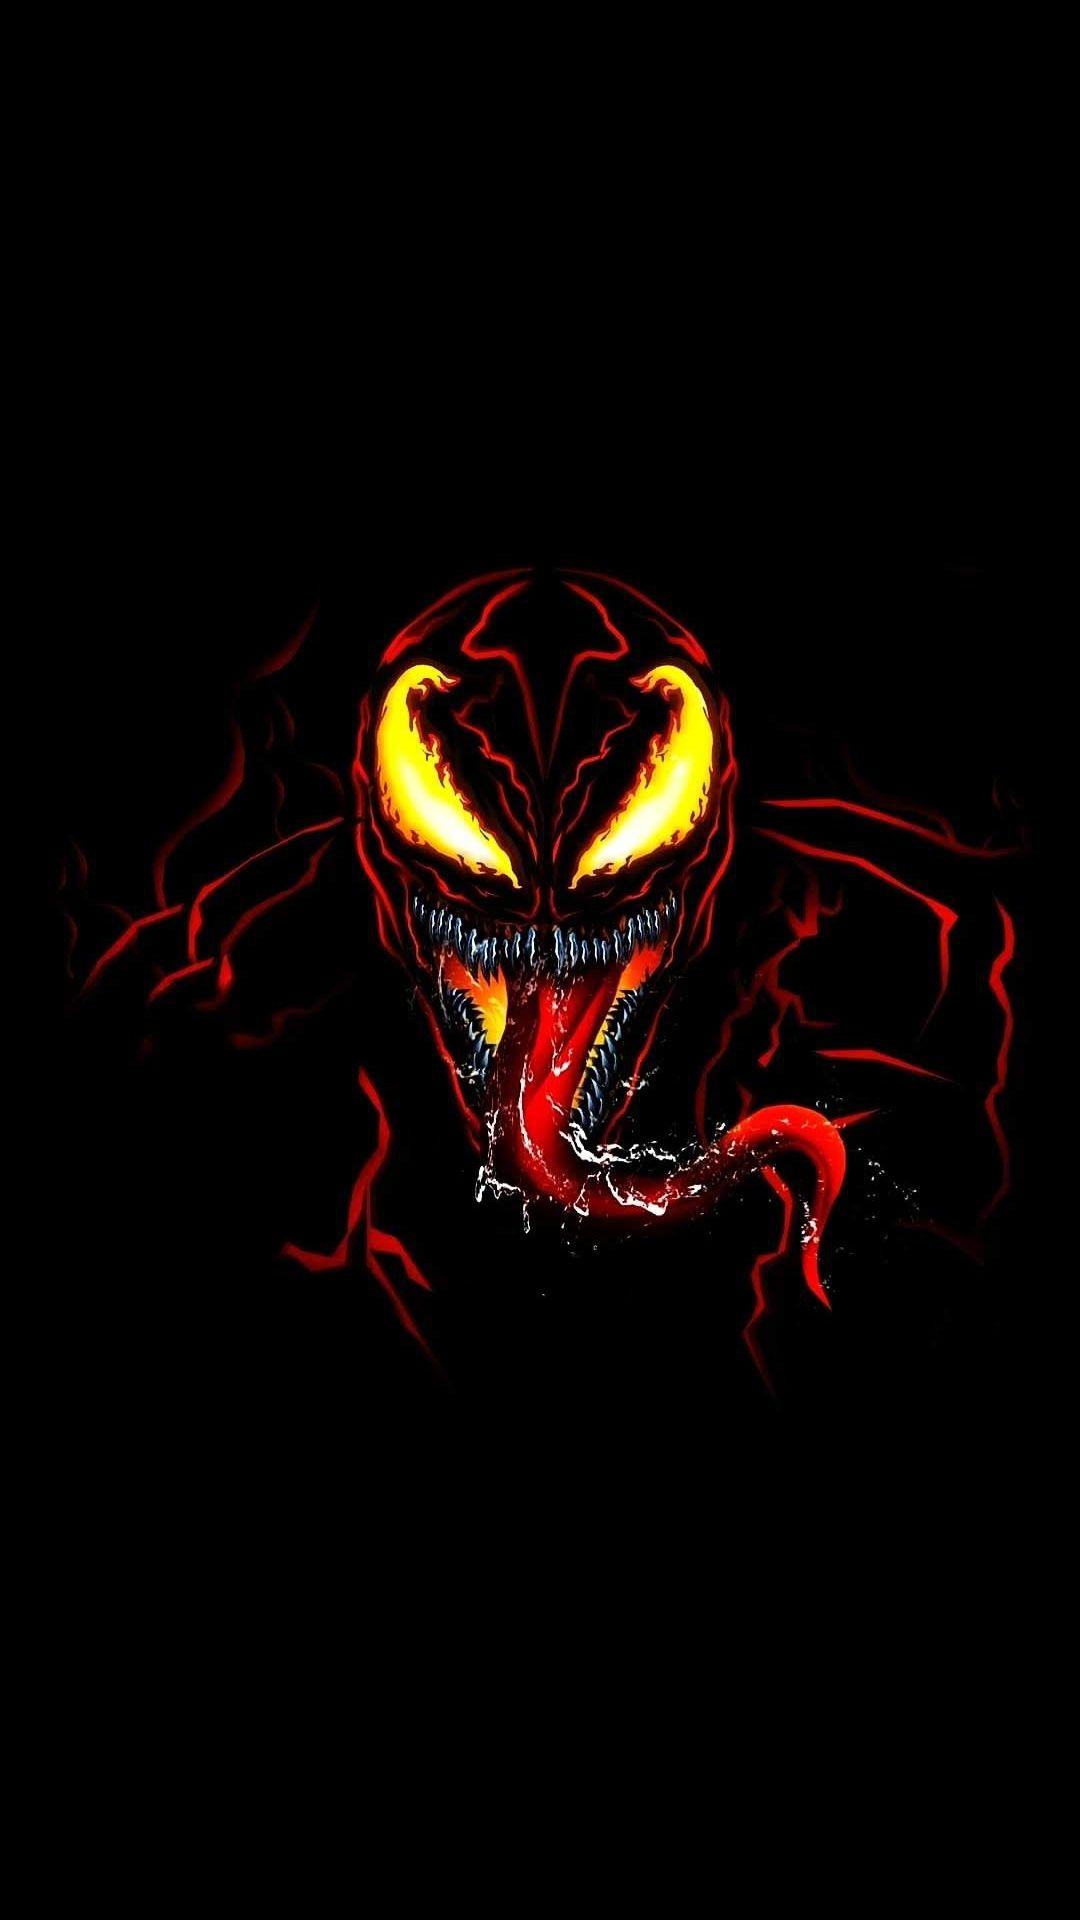 23] Red Venom Wallpapers on WallpaperSafari 1080x1920